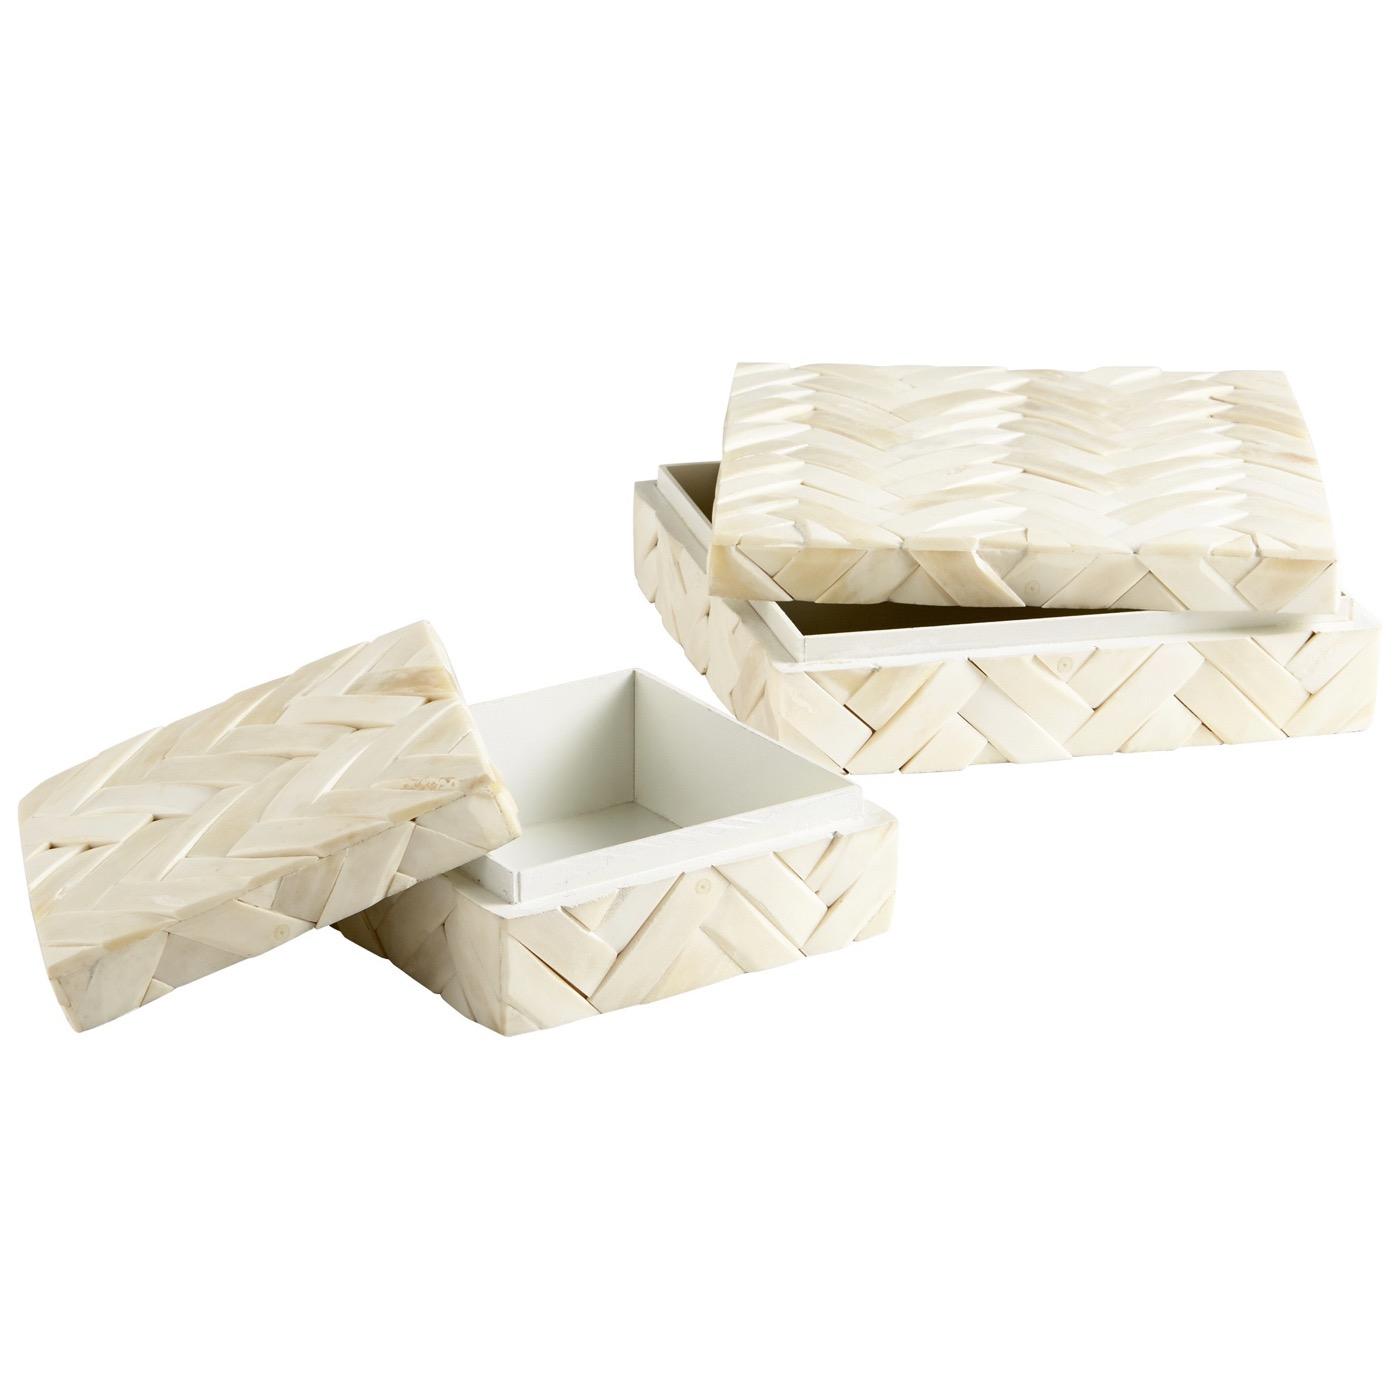 Soloway Bone Boxes